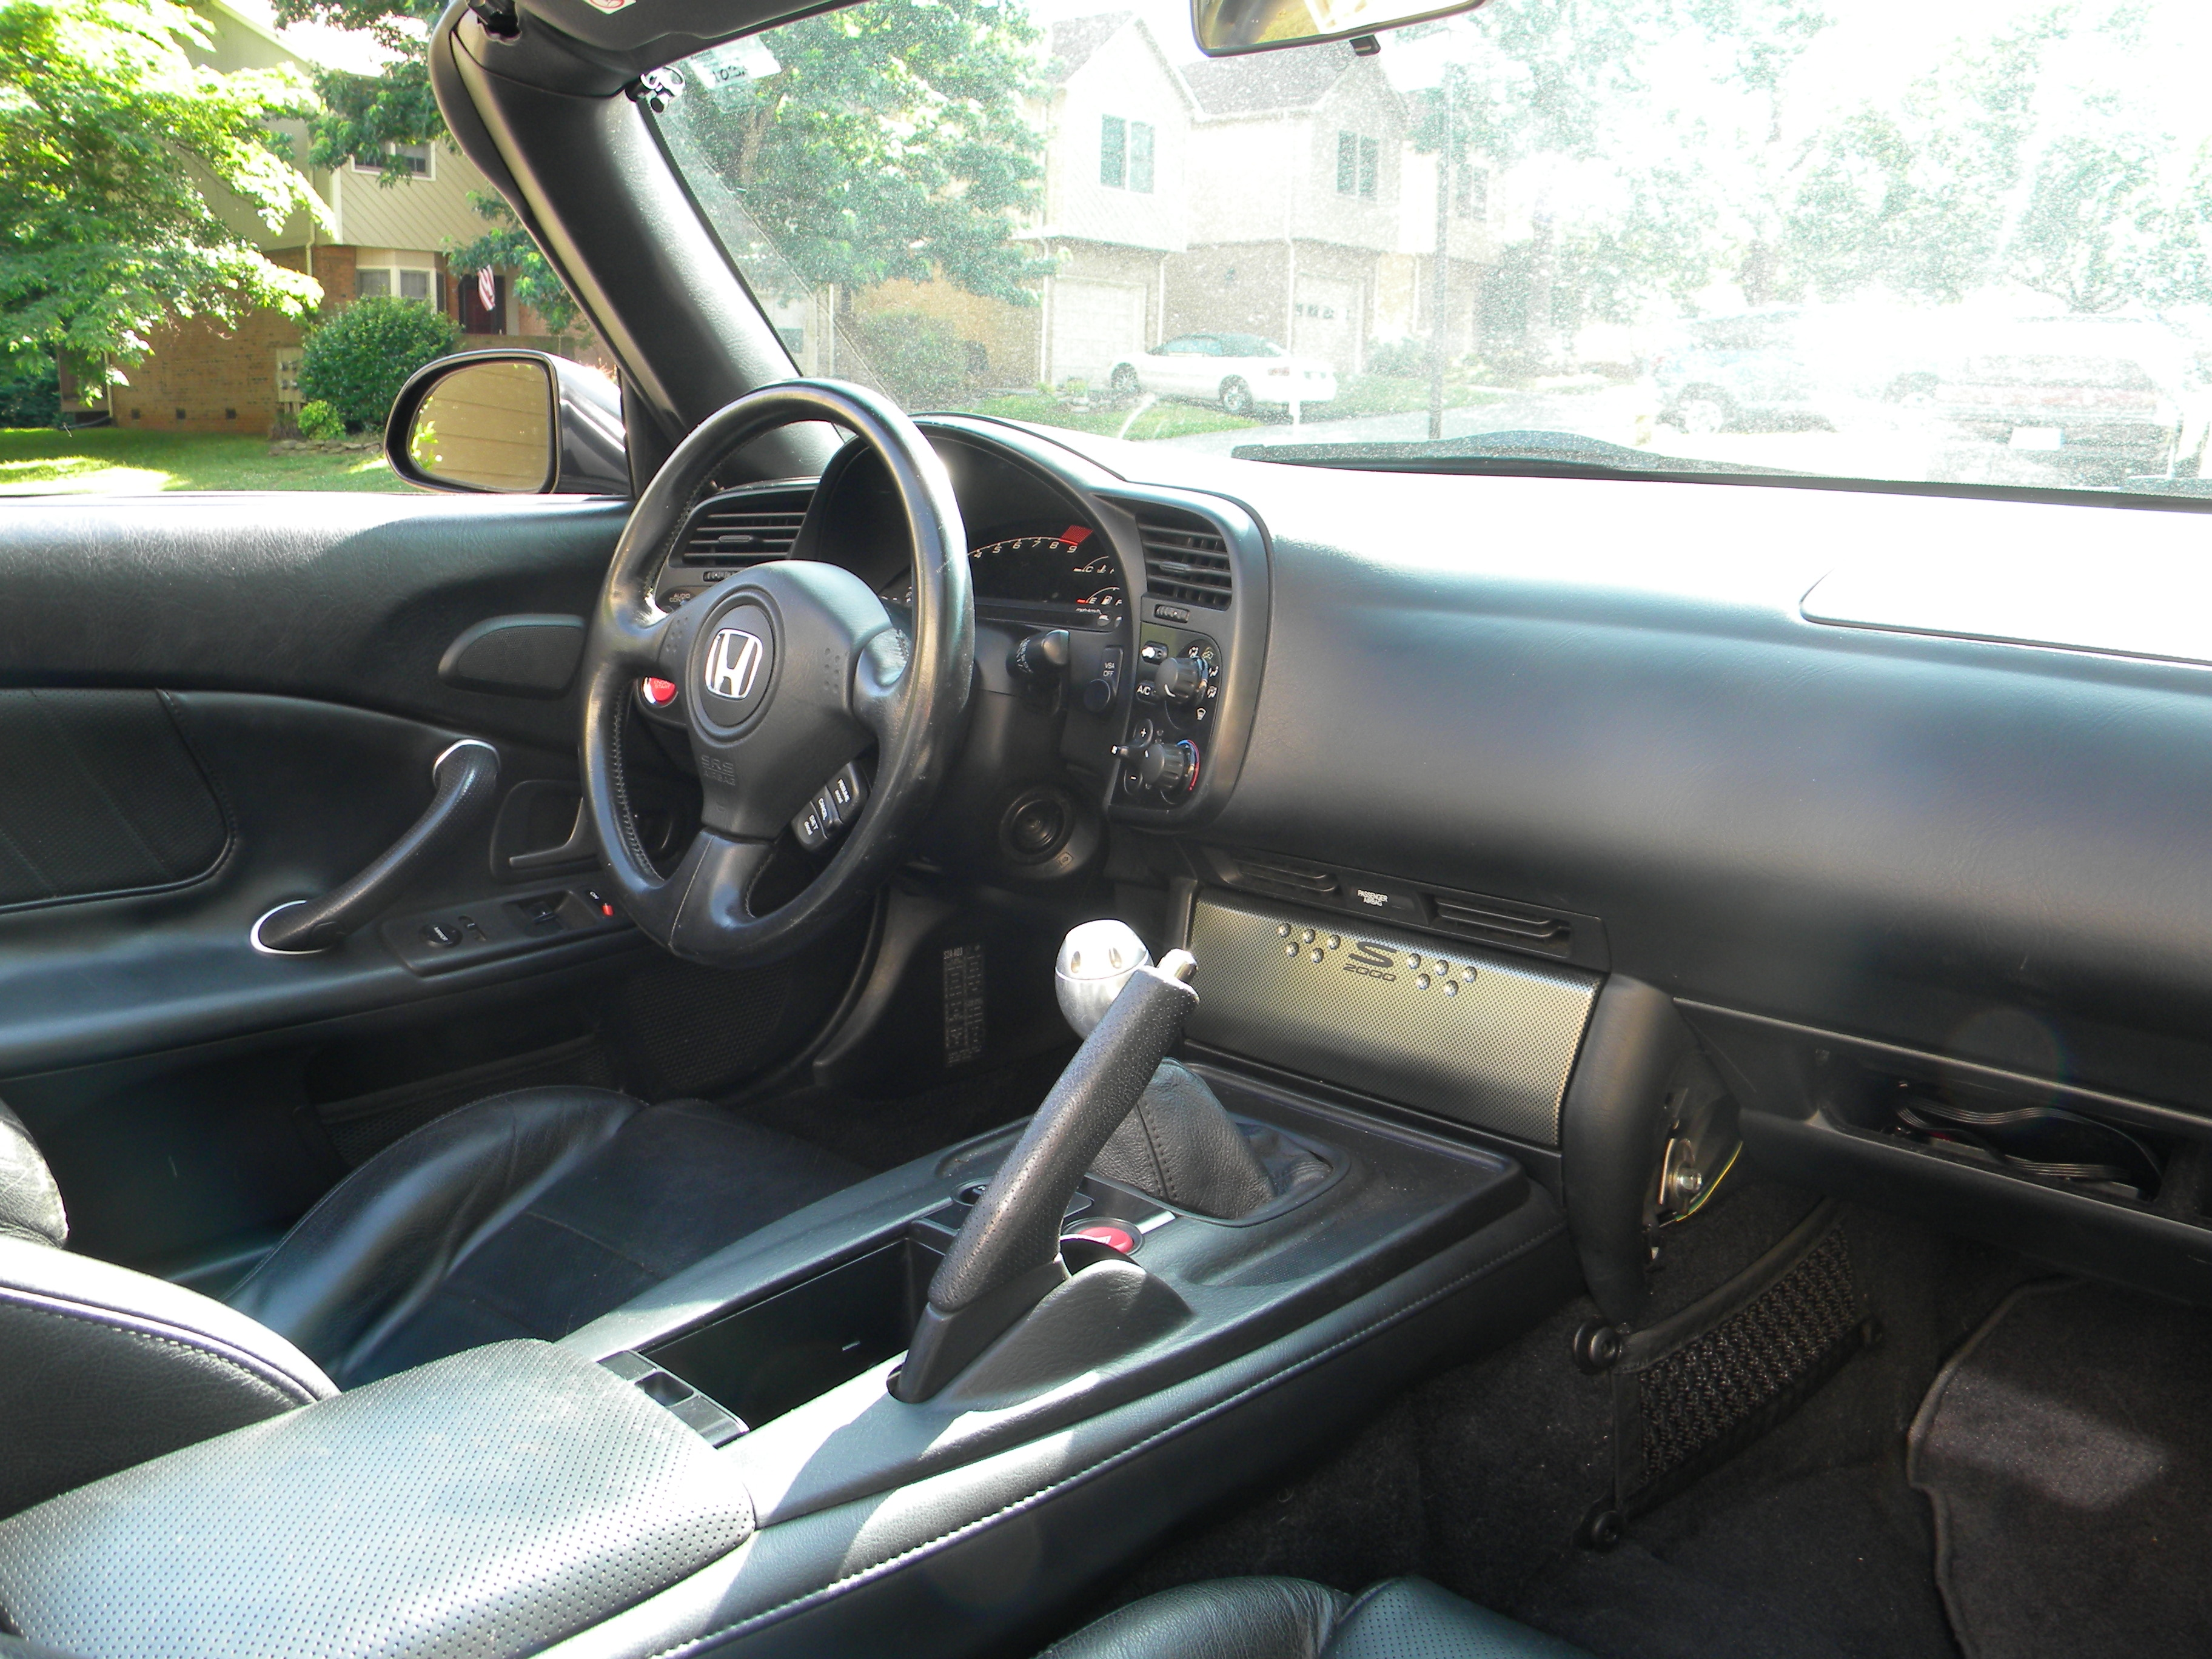 File:Black s2000 interior 1.JPG - Wikimedia Commons